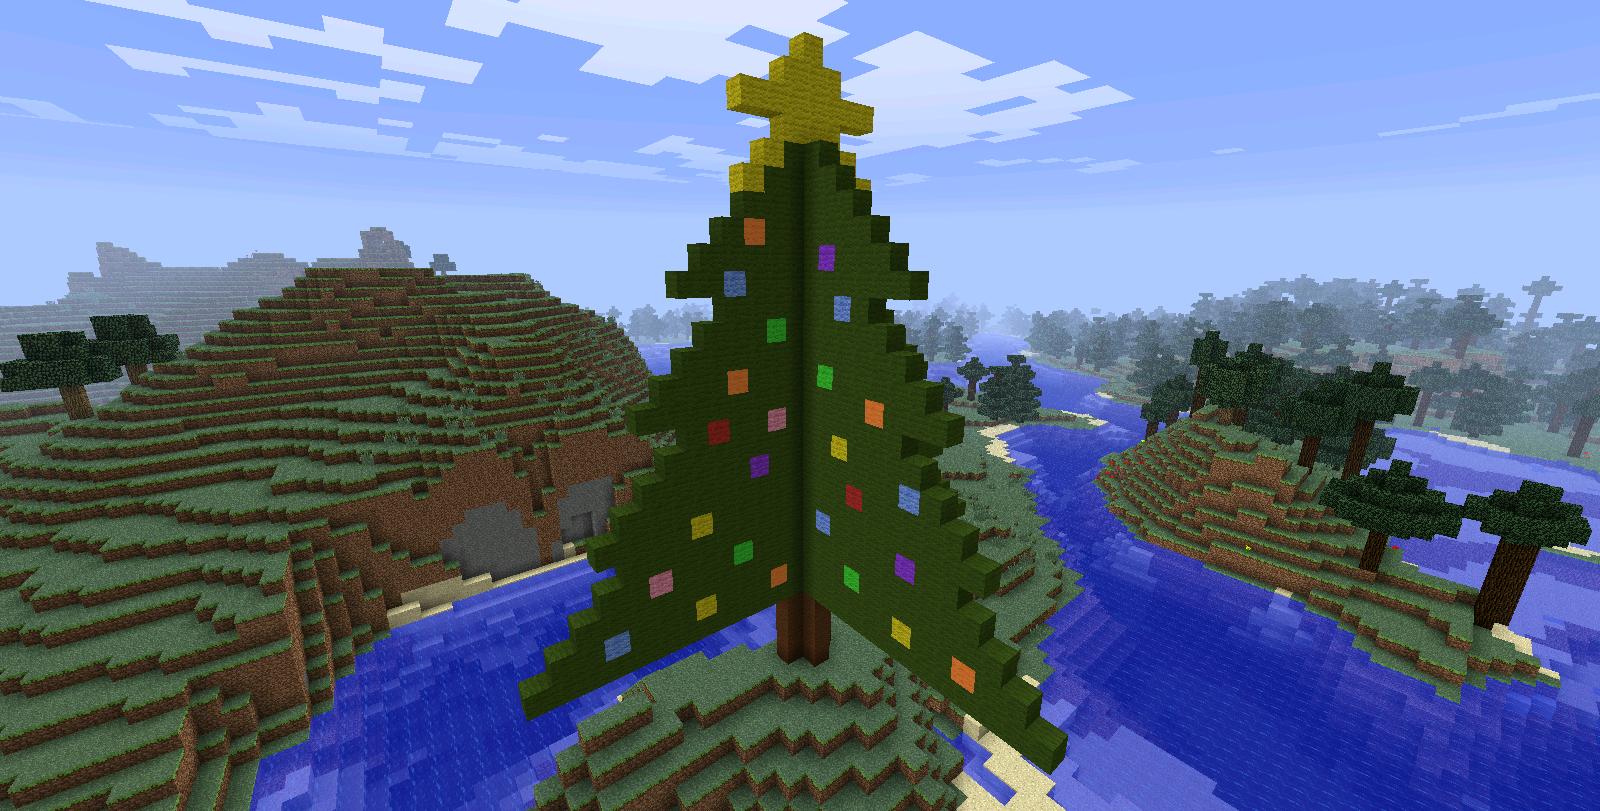 Minecraft Christmas Tree.Christmas Tree Minecraft 1 Of 2 By Bakahentai90 On Deviantart